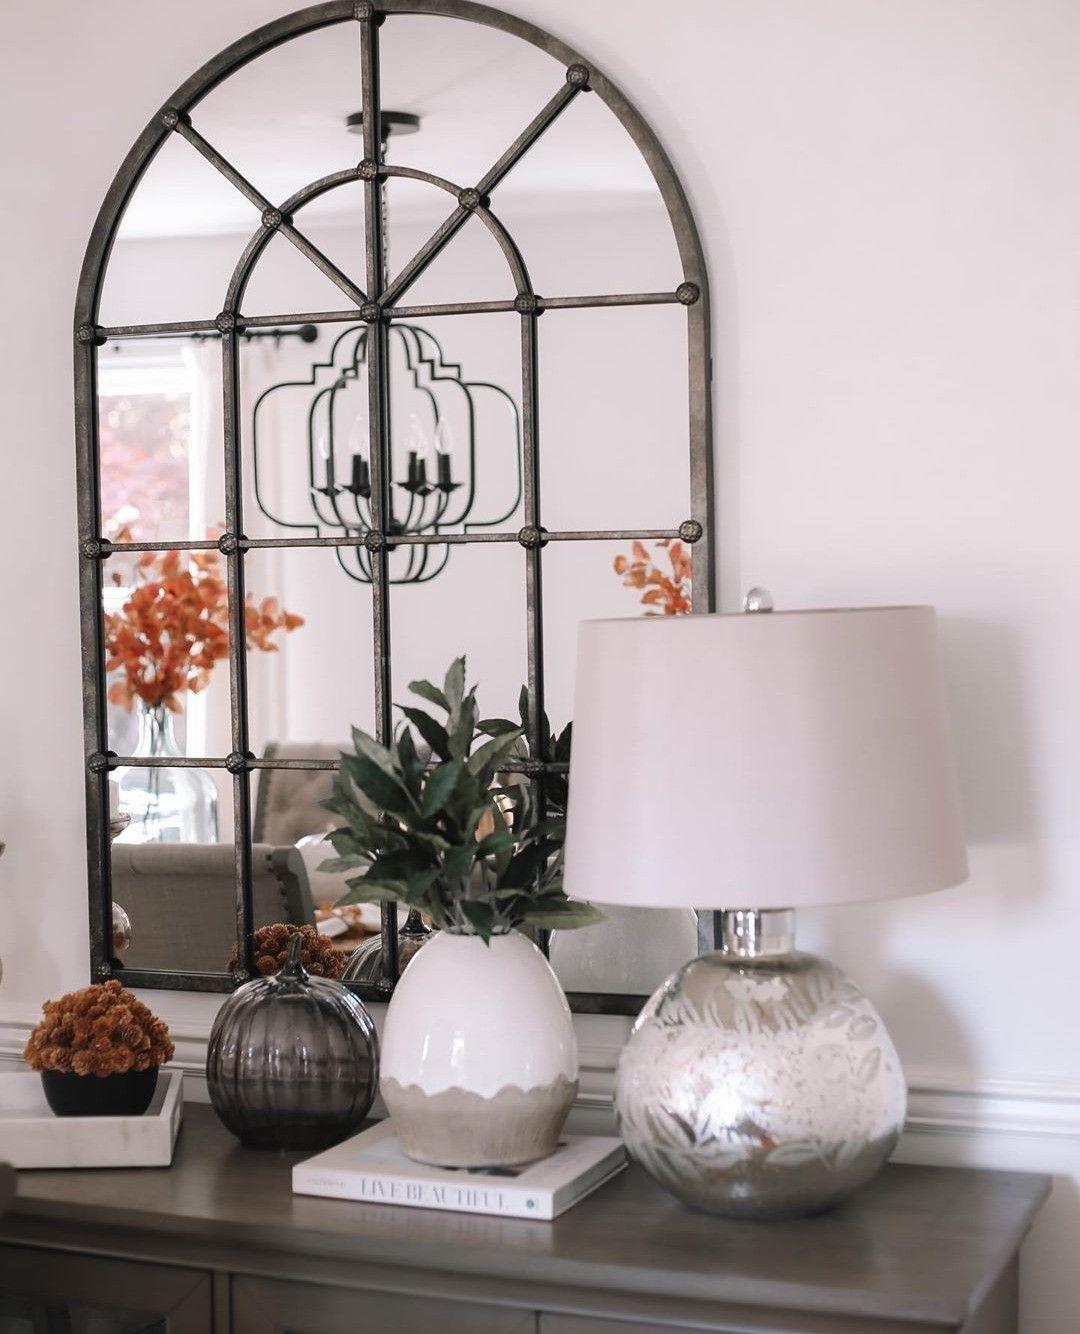 Oficialmente ya se puede empezar a decorar para nadivad.... yo prefiero la deco otoñal Tiene algo especial . . . @anna_brstyle #mirror #homesense #interiordesign #homedesign #lovelyinterior #interiordetails #interiorblogger #aesthetic #decoblogger #rinconesqueinspiran #homedecor #instadeco #decoration #fall #autumn #november #sweaterweather